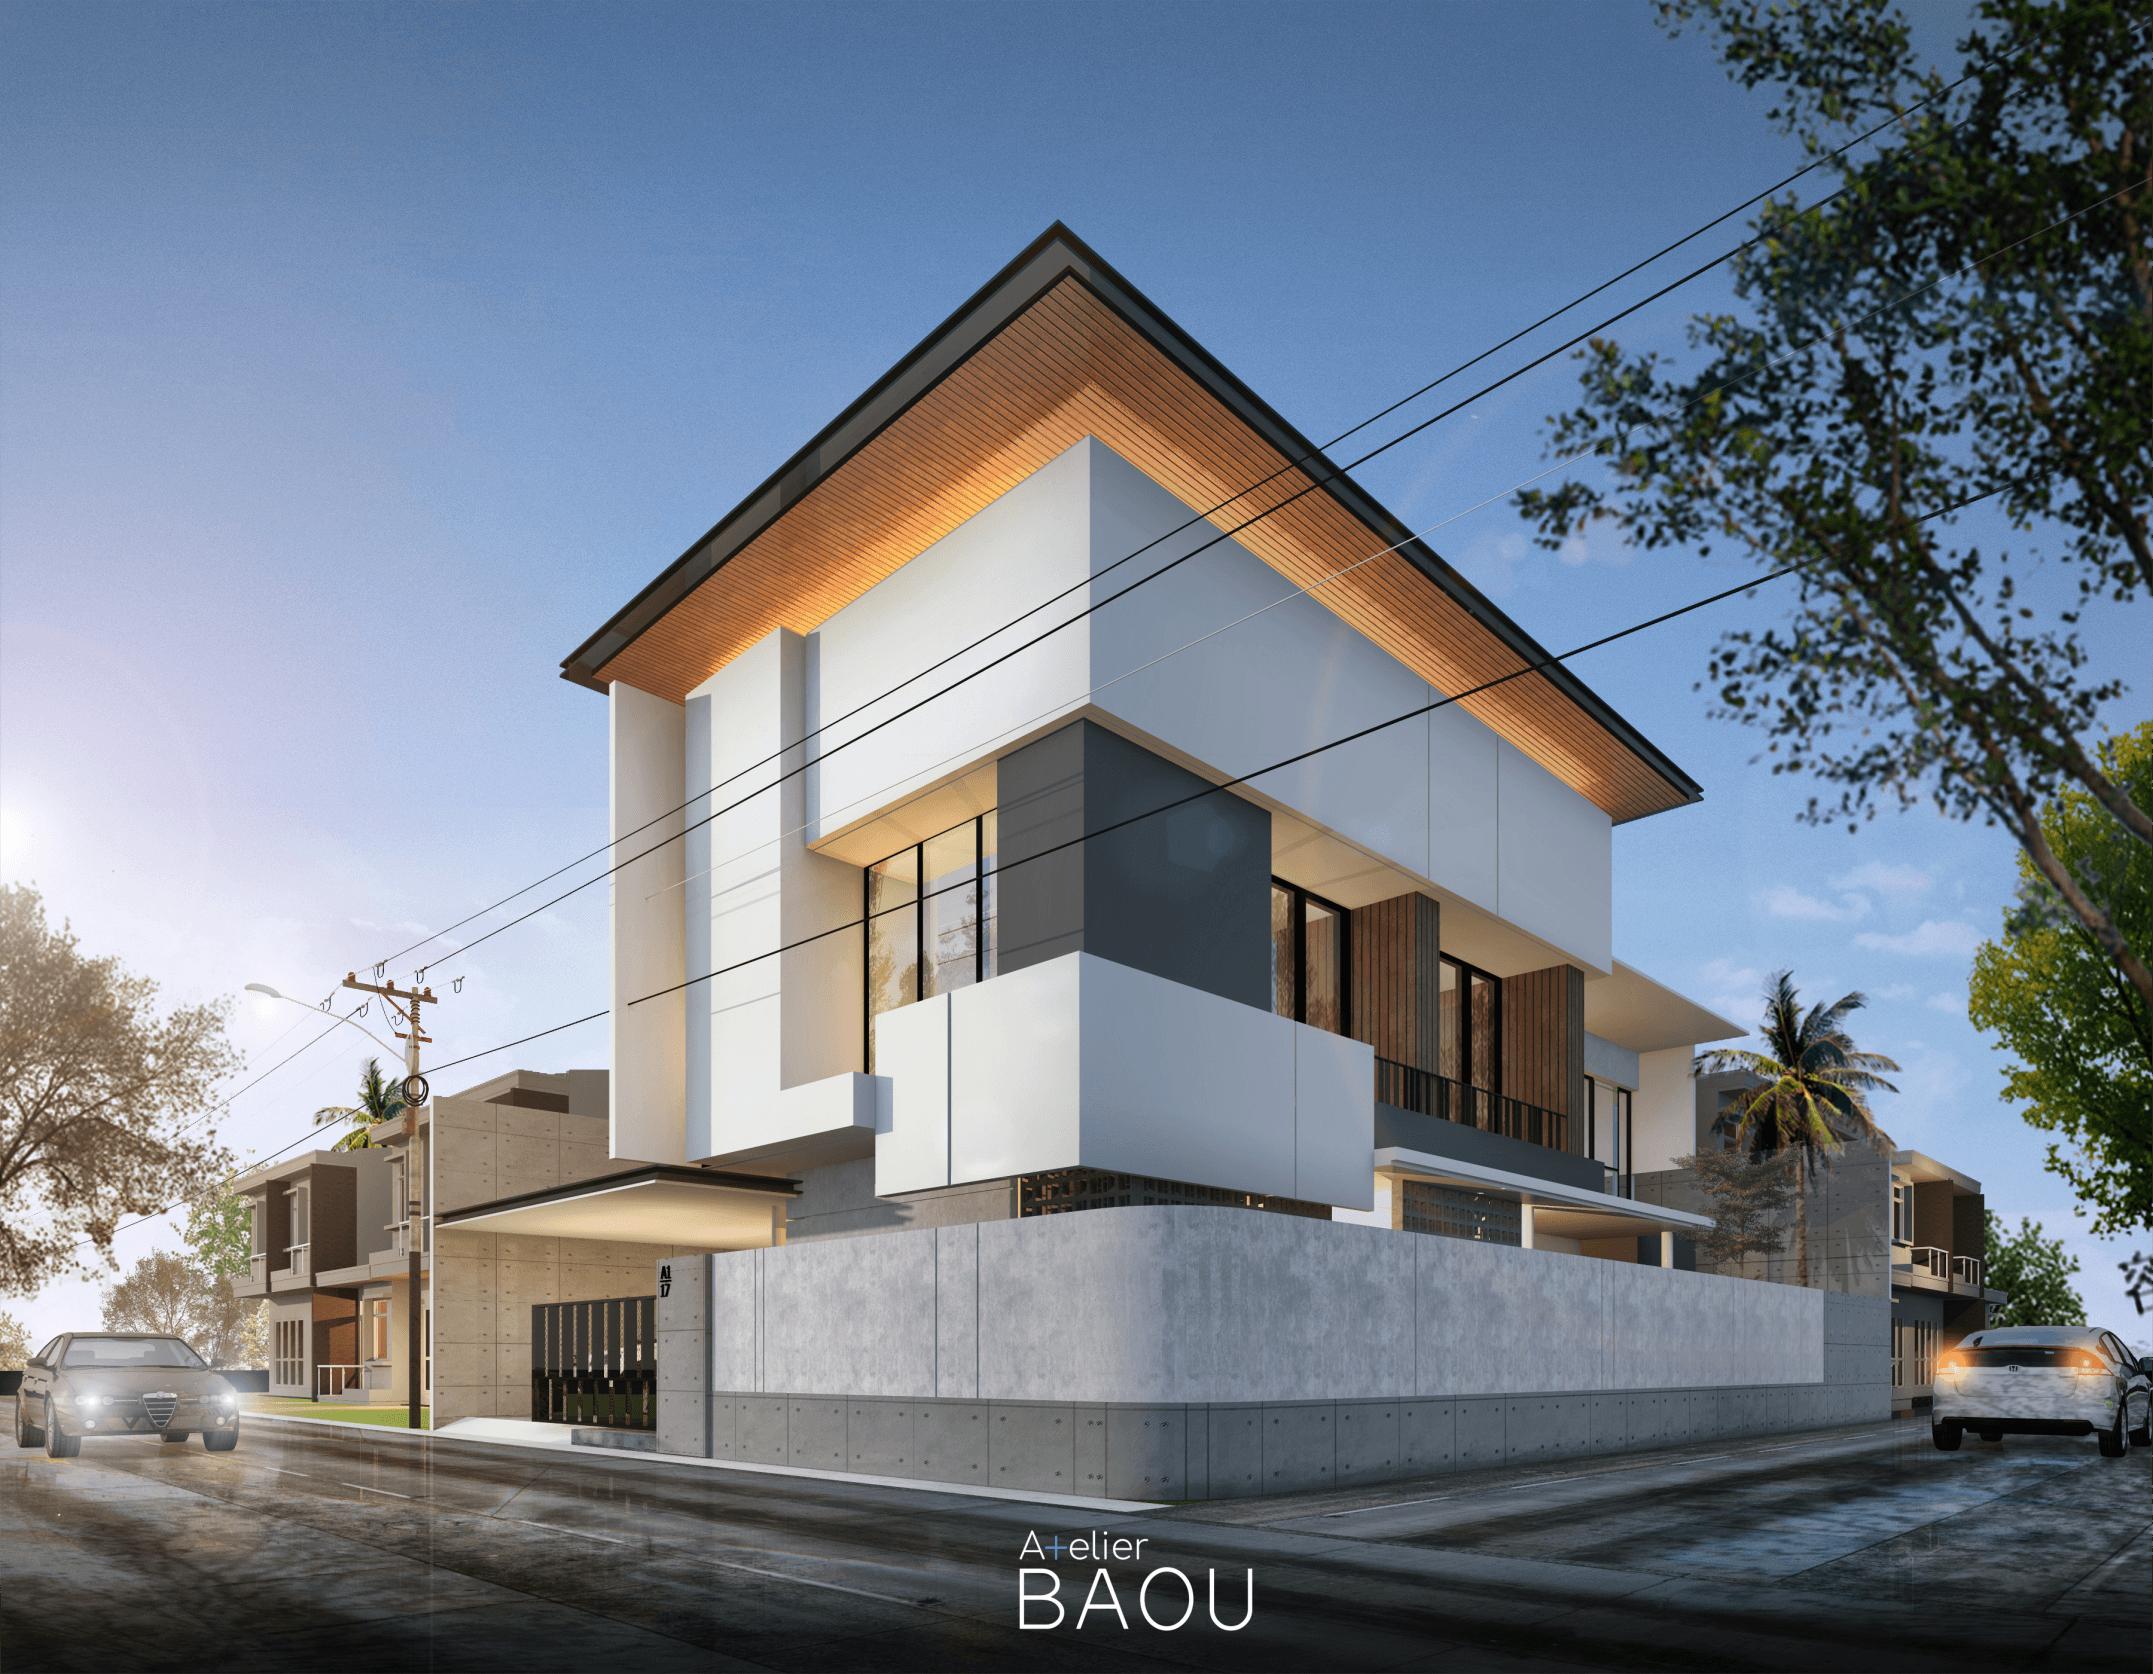 Atelier Baou Ib House Sungai Liat, Kabupaten Bangka, Kepulauan Bangka Belitung, Indonesia Sungai Liat, Kabupaten Bangka, Kepulauan Bangka Belitung, Indonesia Atelier-Baou-Ib-House   86489